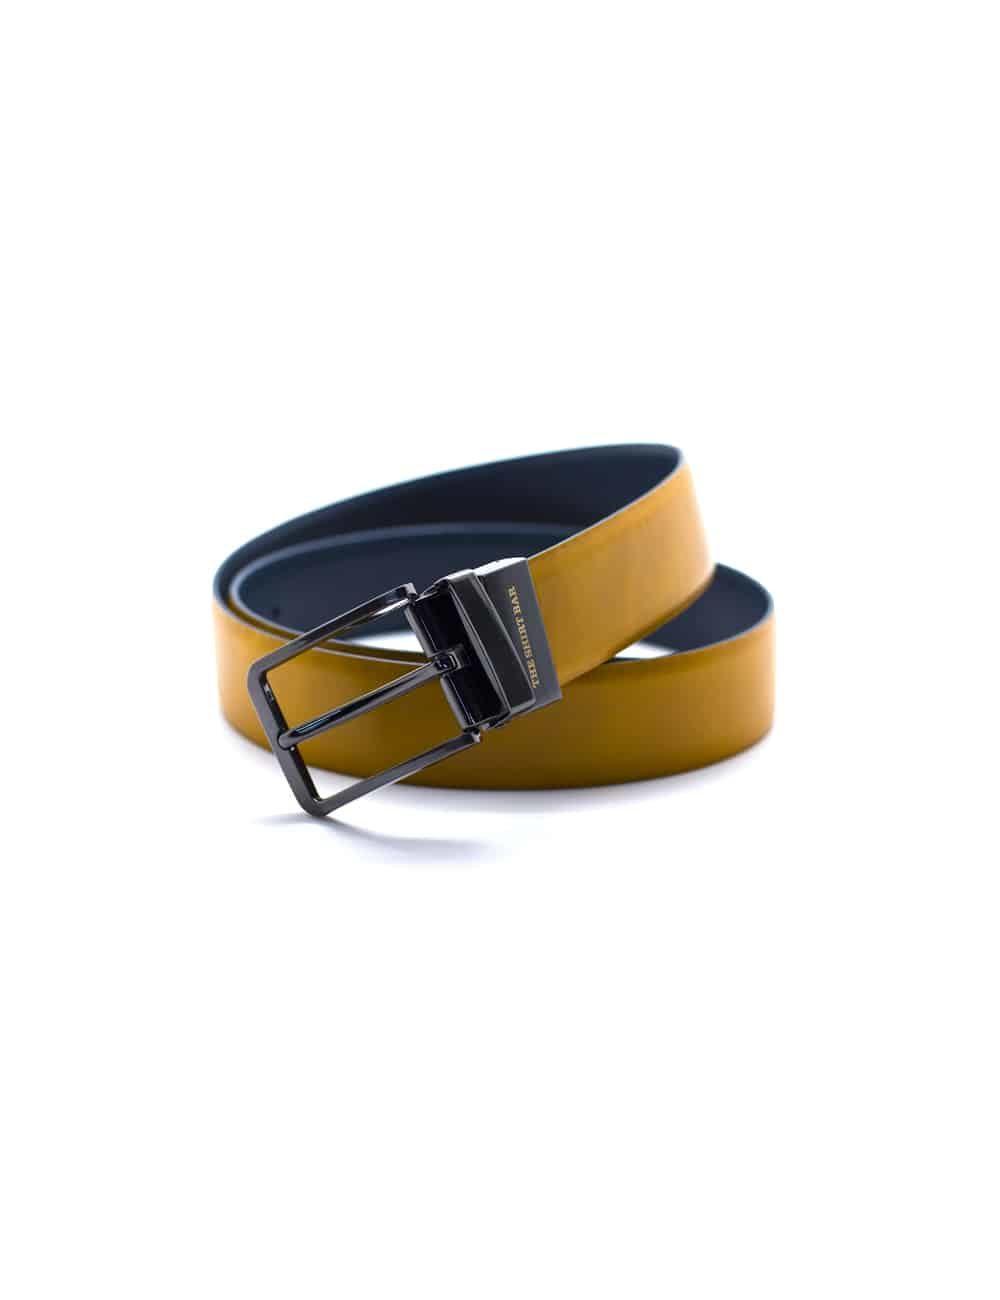 Tan / Navy Reversible Leather Belt LBR11.6